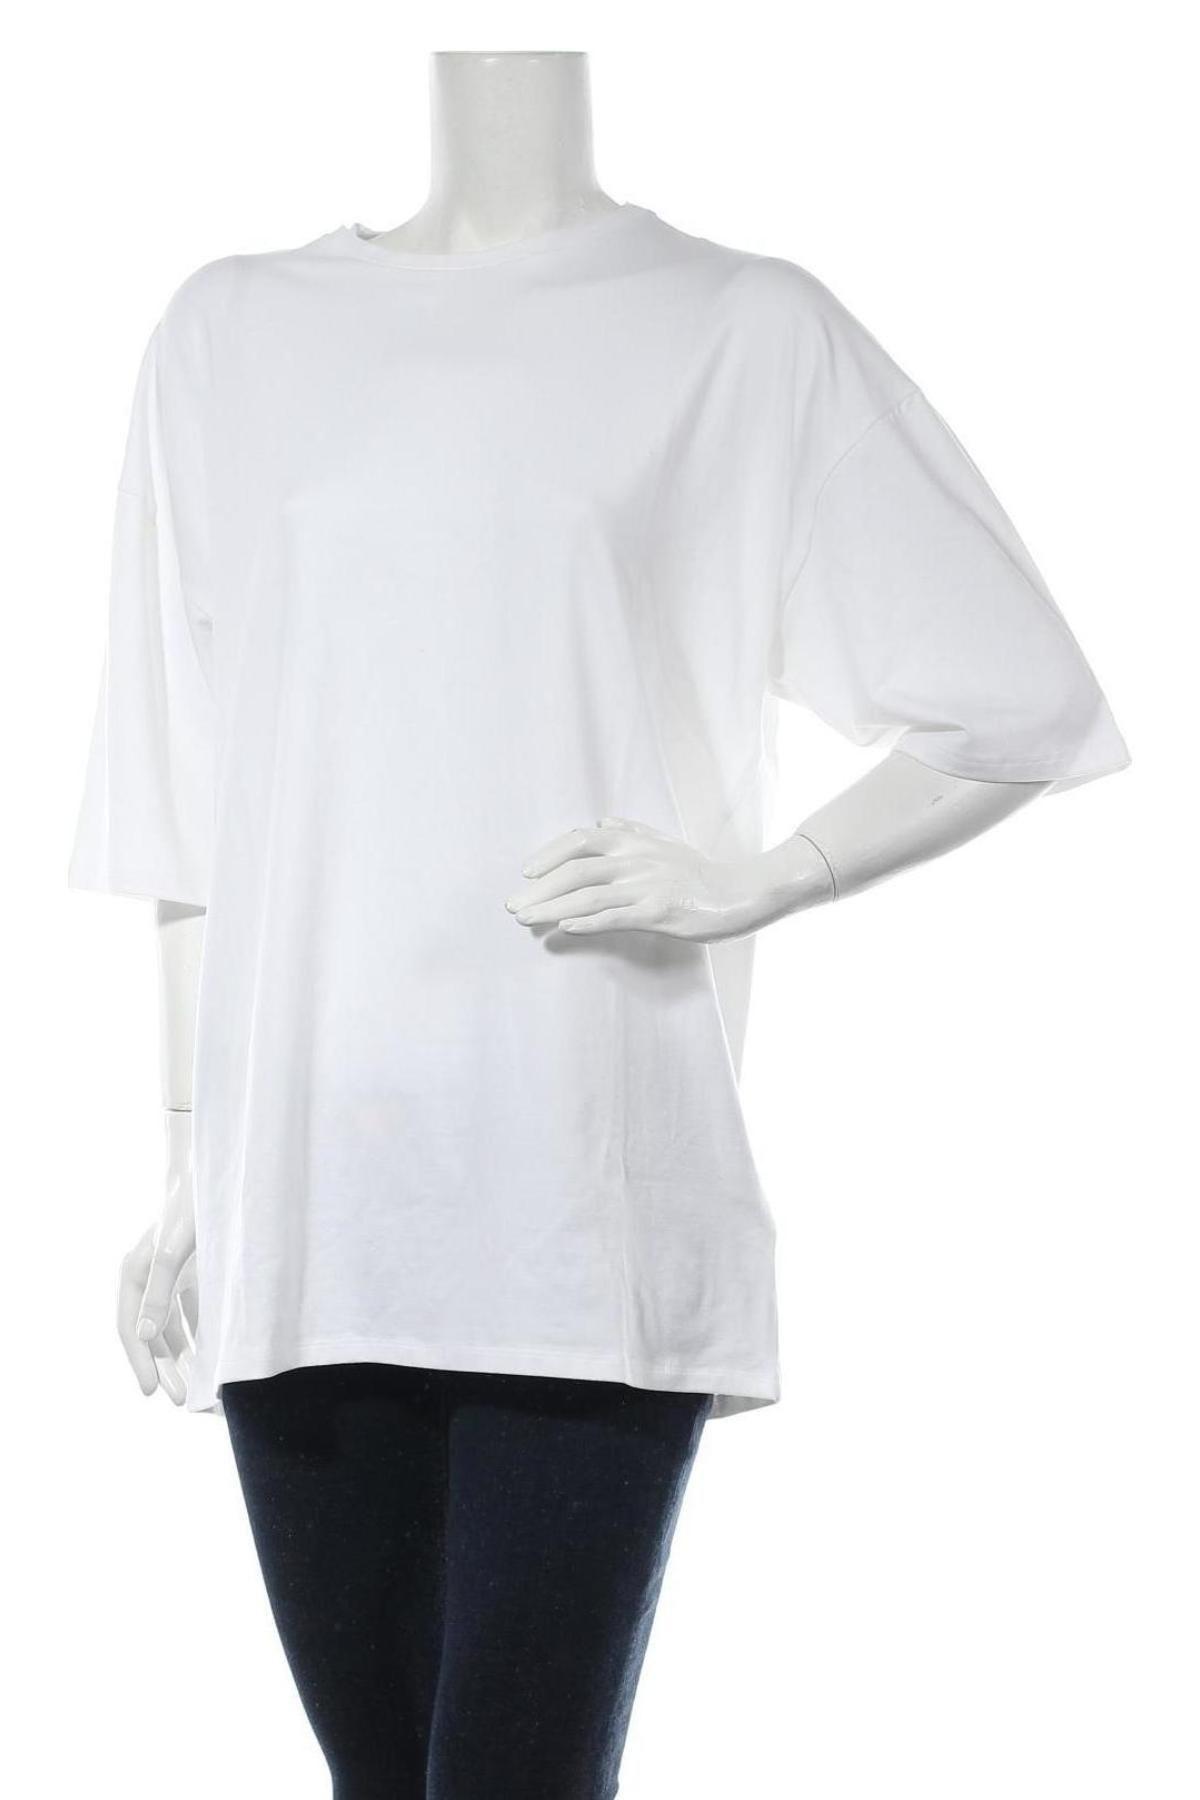 Туника Stefanie Giesinger for Nu-in, Размер M, Цвят Бял, 64% лиосел, 32% памук, 4% еластан, Цена 63,20лв.